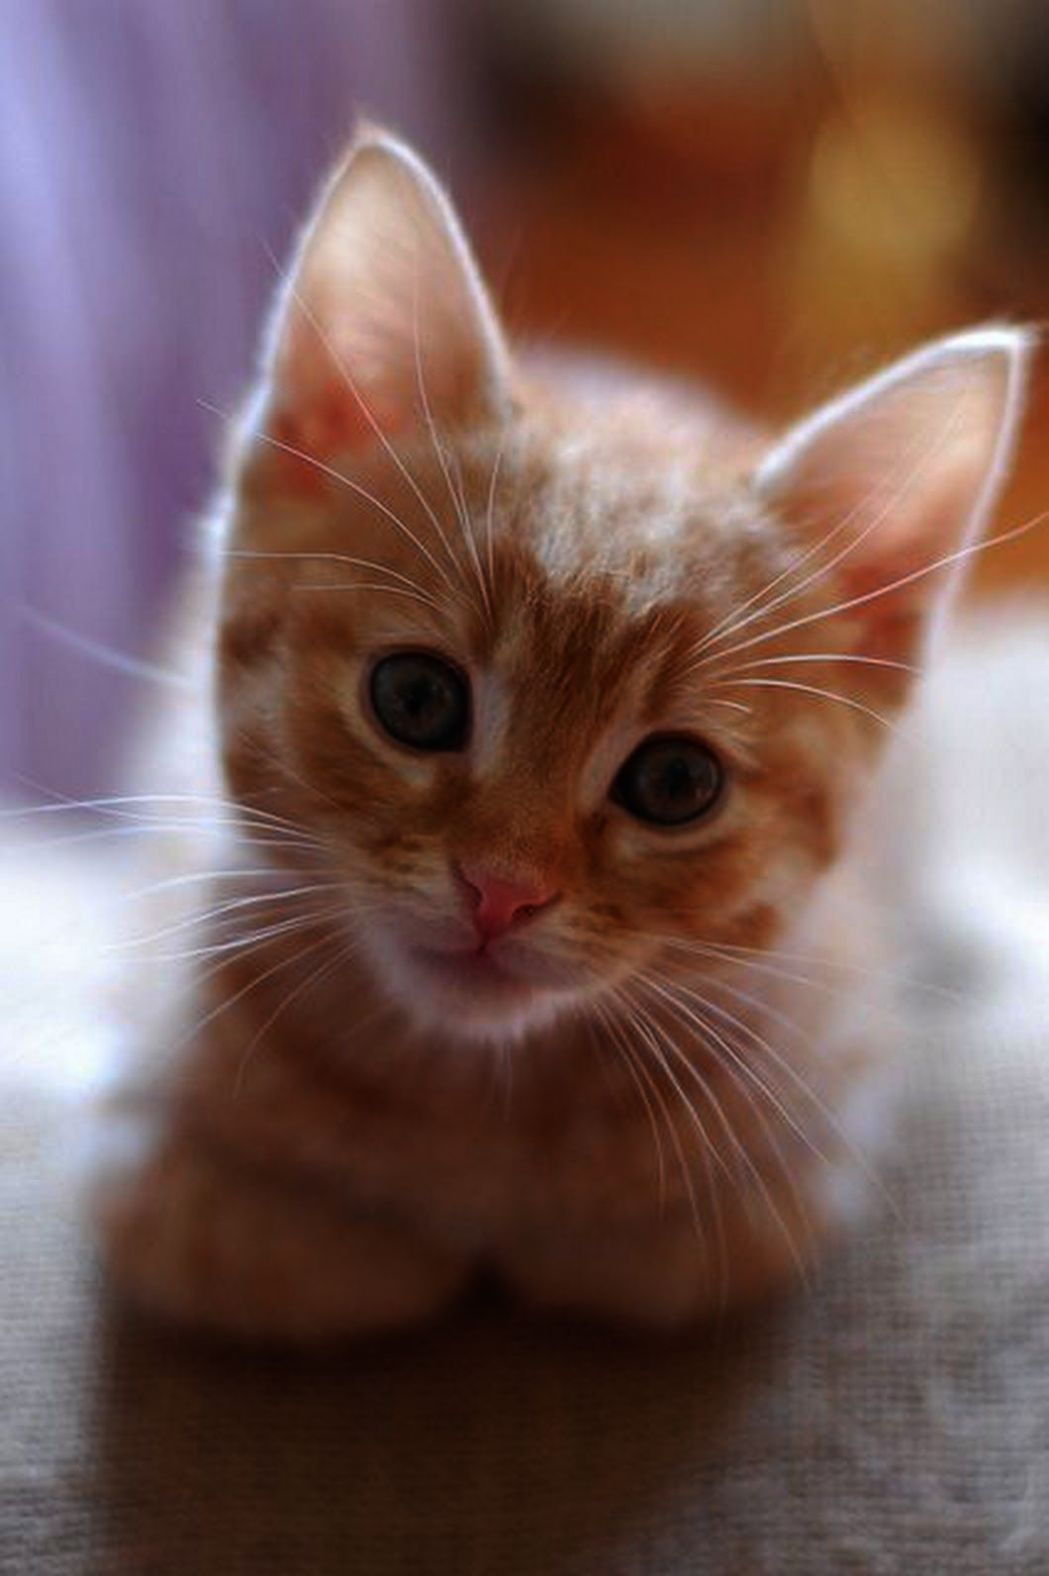 Cute Cats Cartoon Images Cute Newborn Kittens Meowing